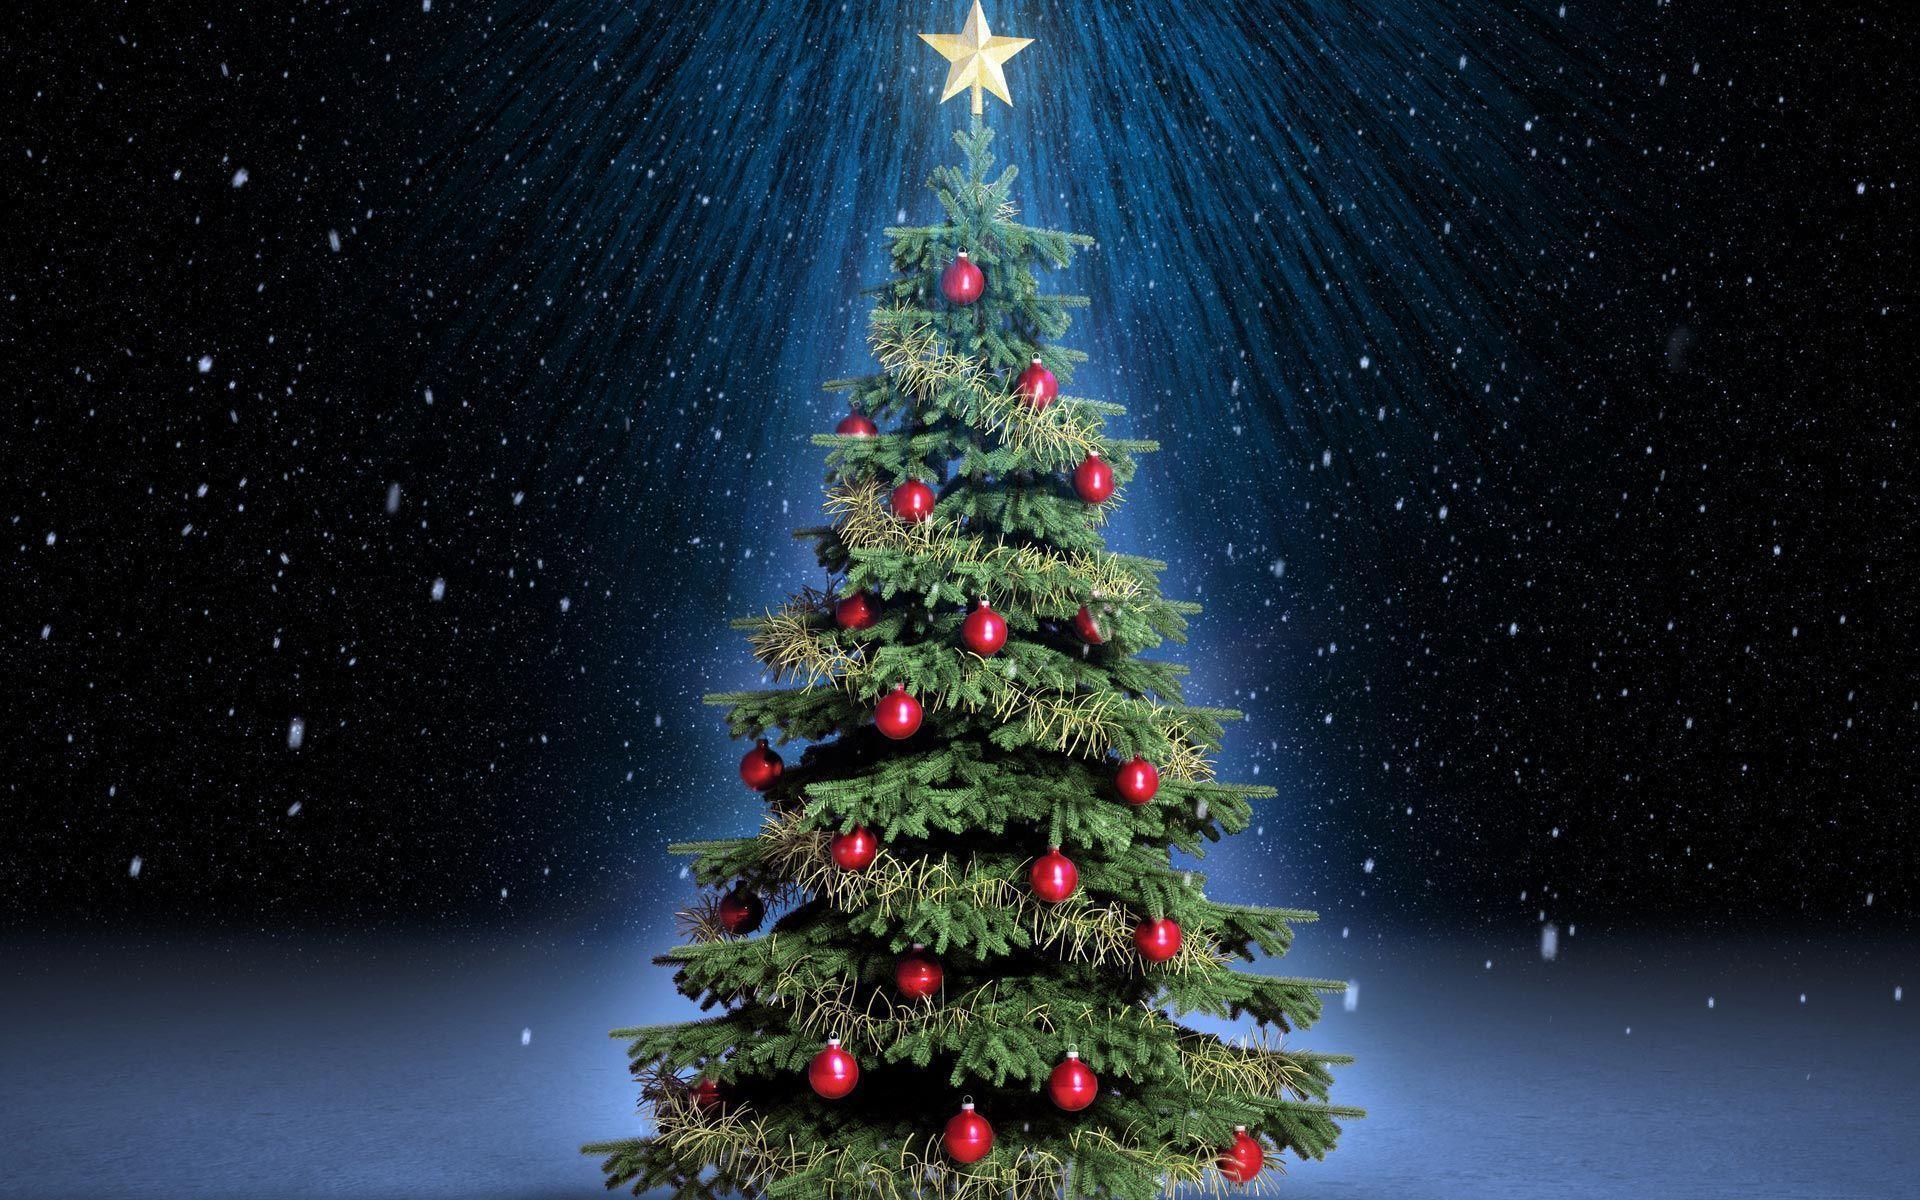 Cute Christmas Tree Wallpapers Top Free Cute Christmas Tree